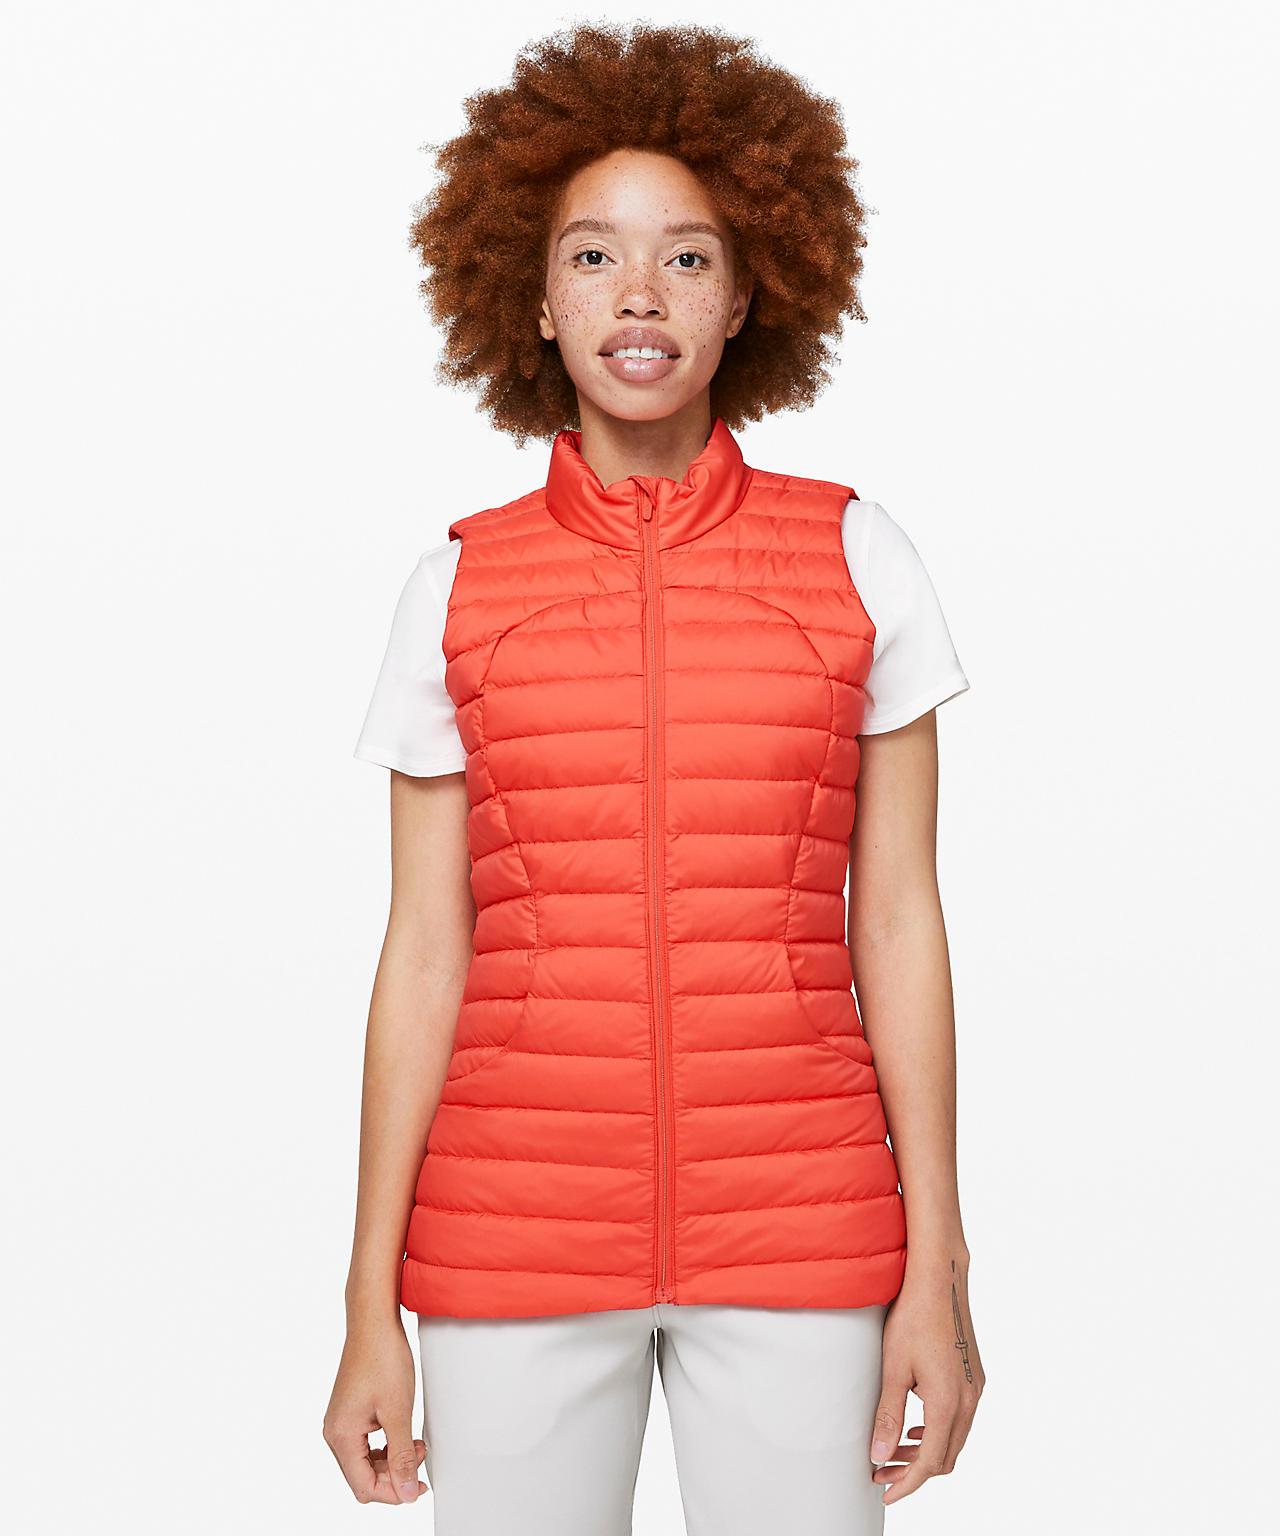 Pack It Down vest, Lululemon Upload